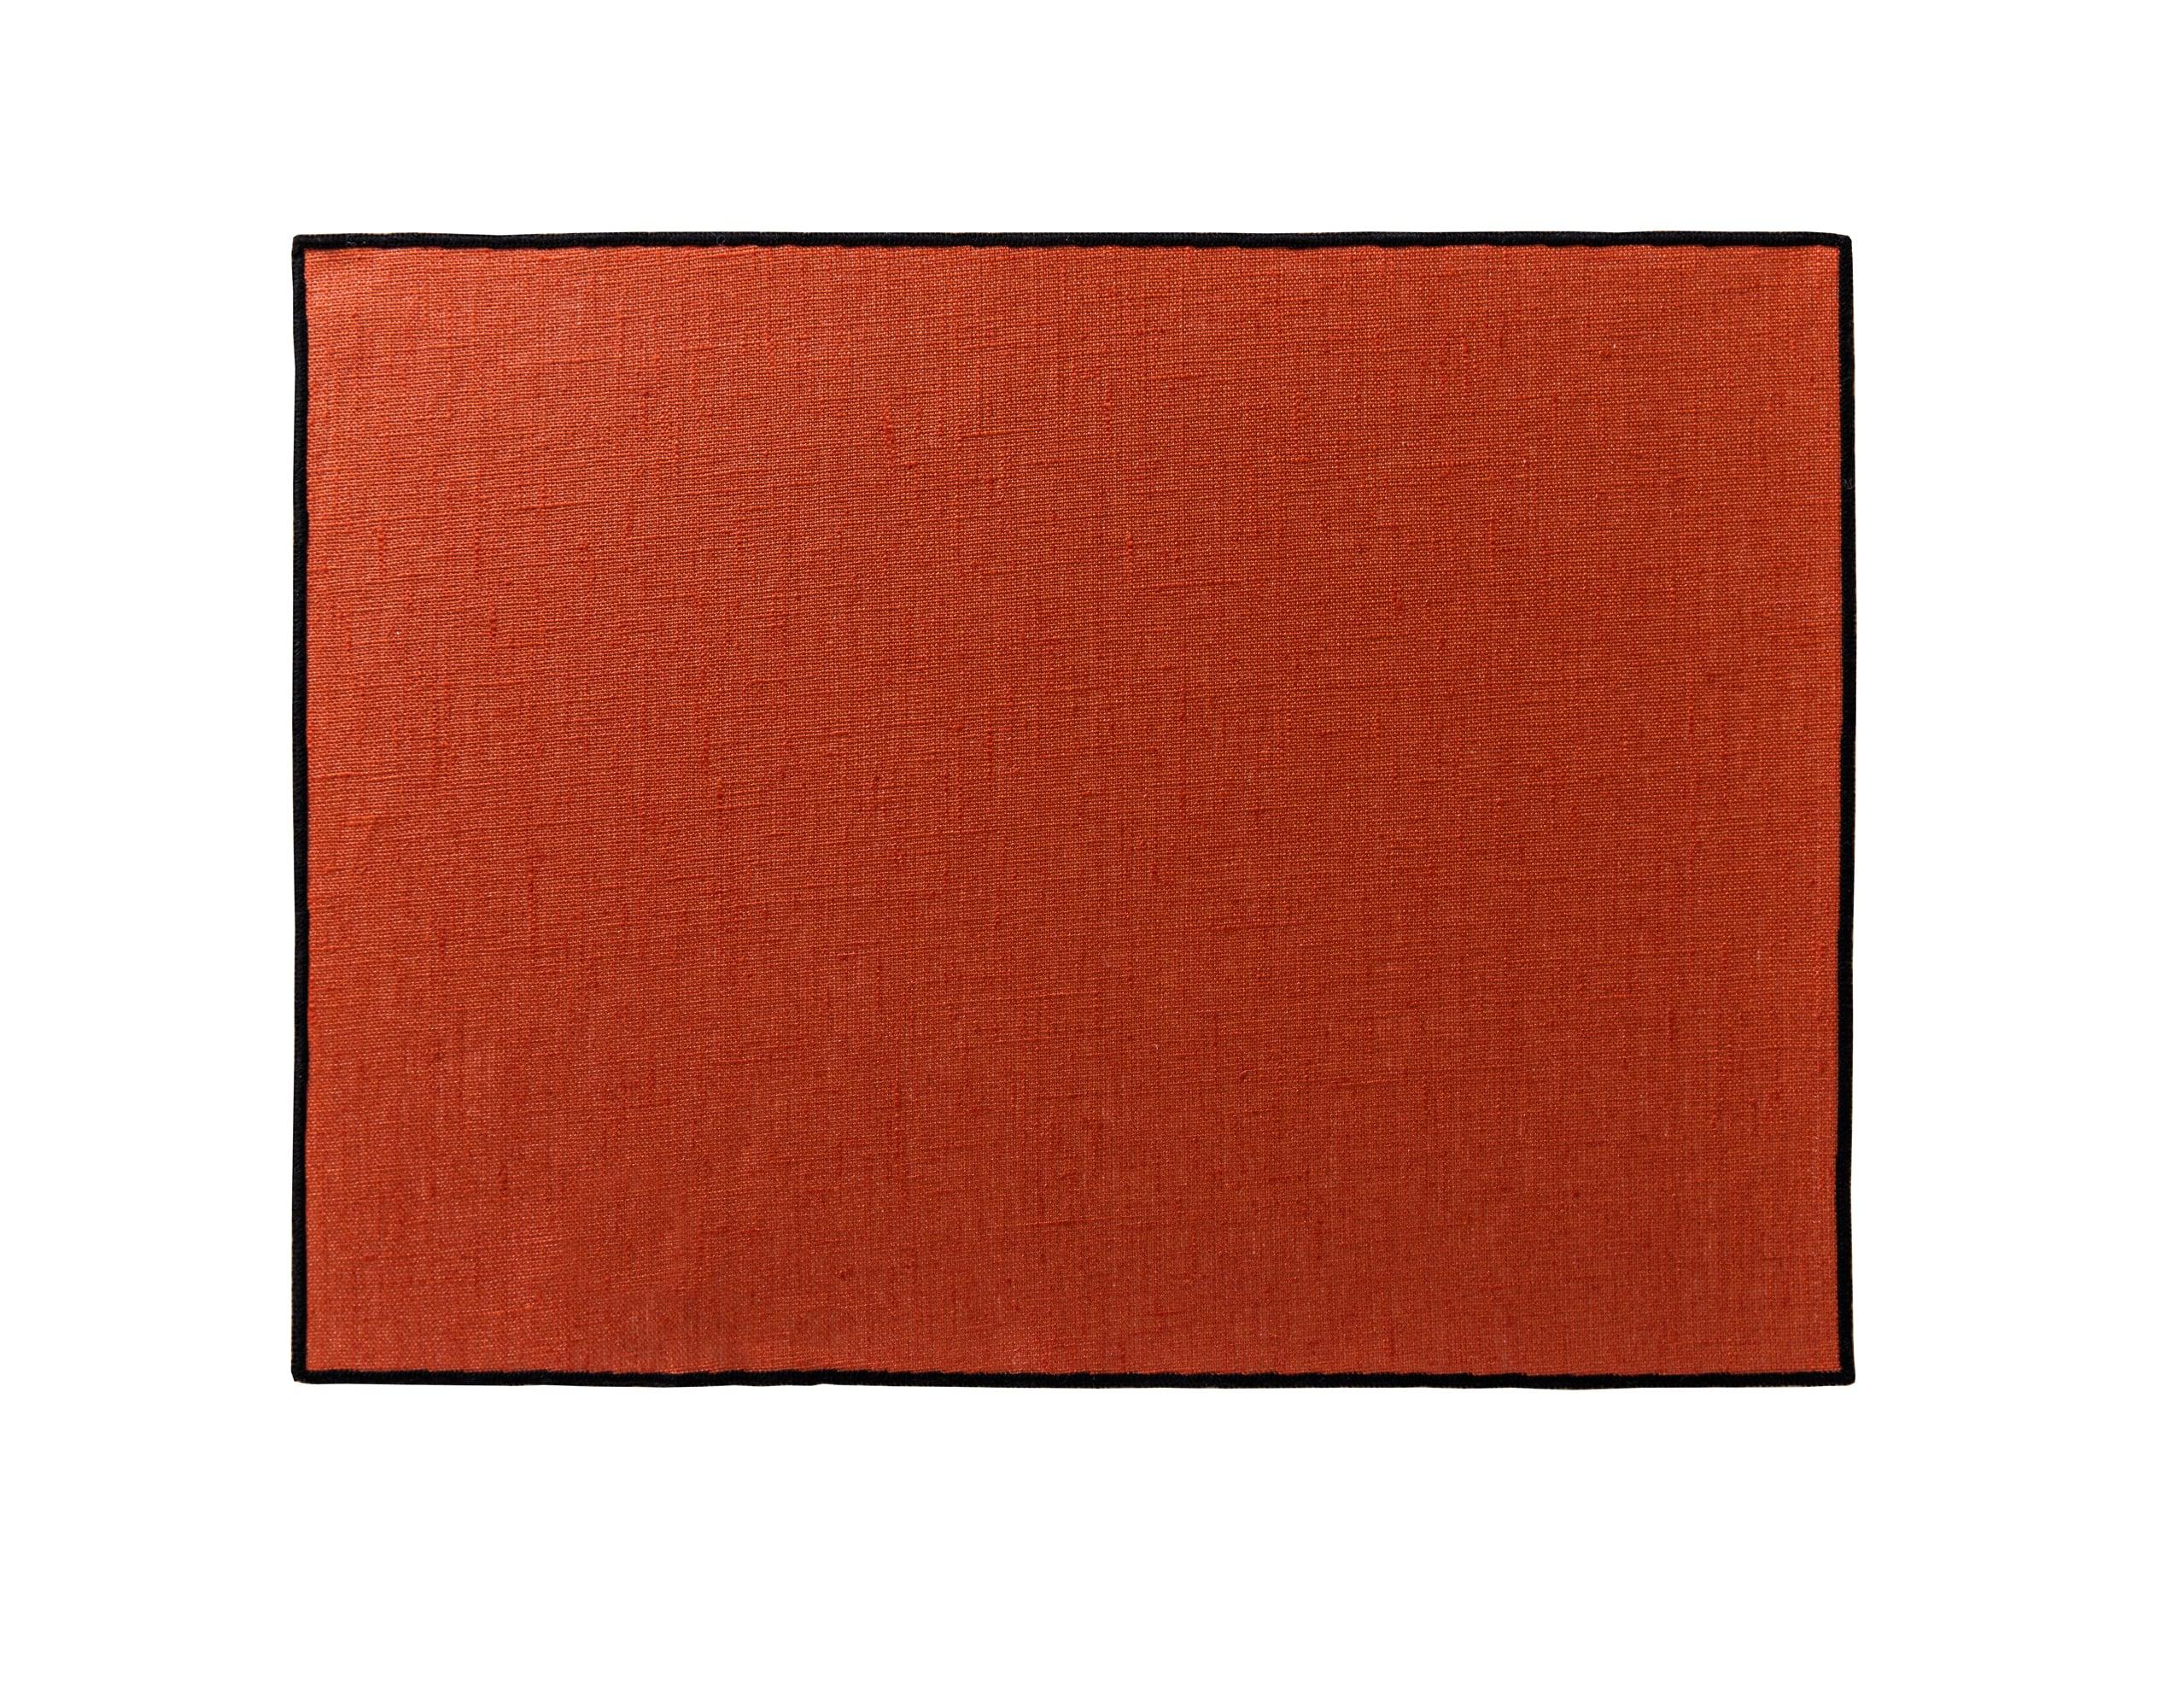 Lot de 4 sets de table orange en lin 35x48